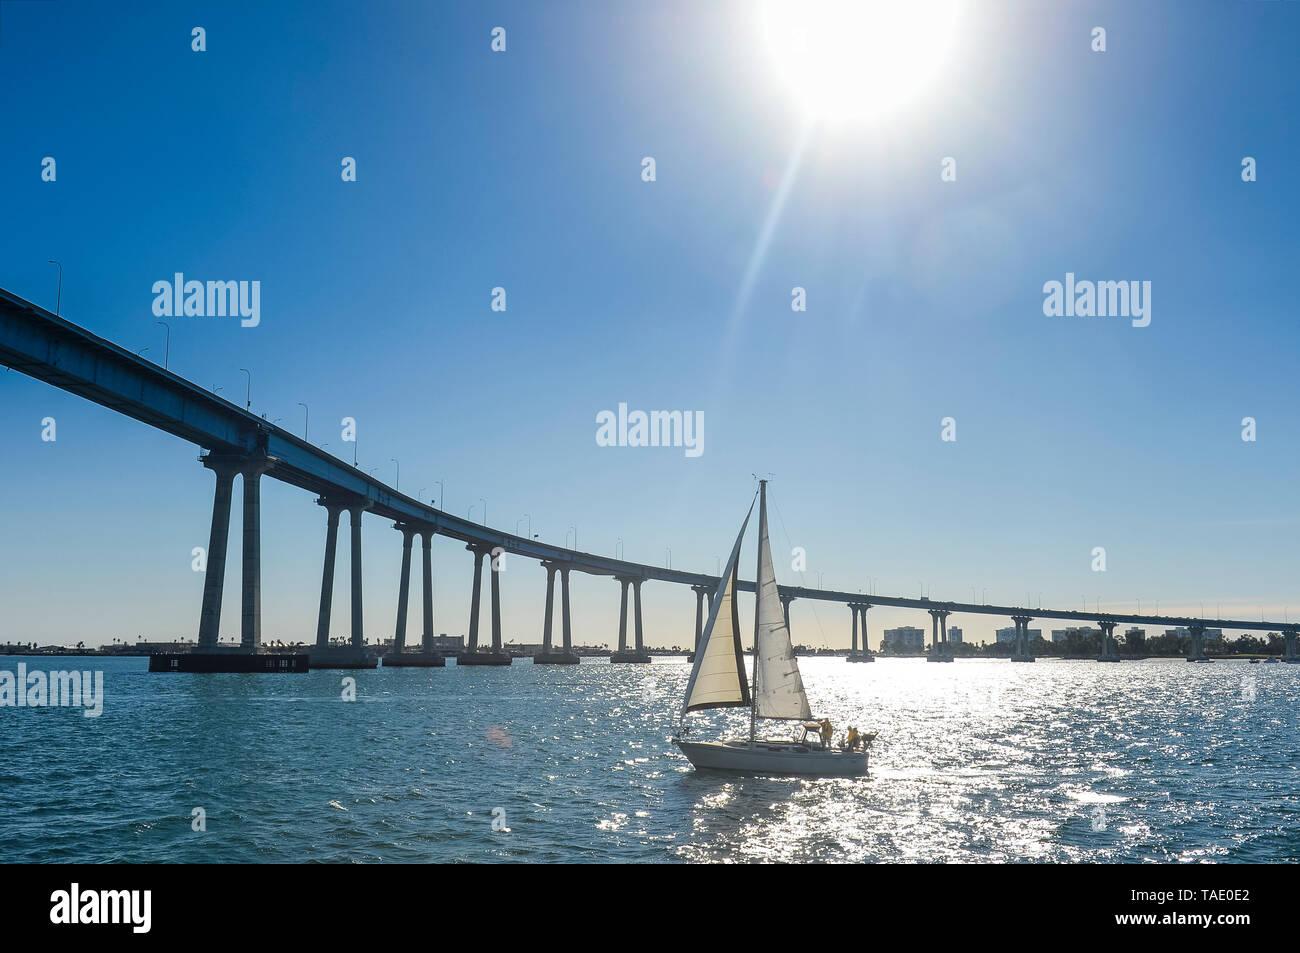 USA, California, San Diego, Harbour, Coronado bridge - Stock Image